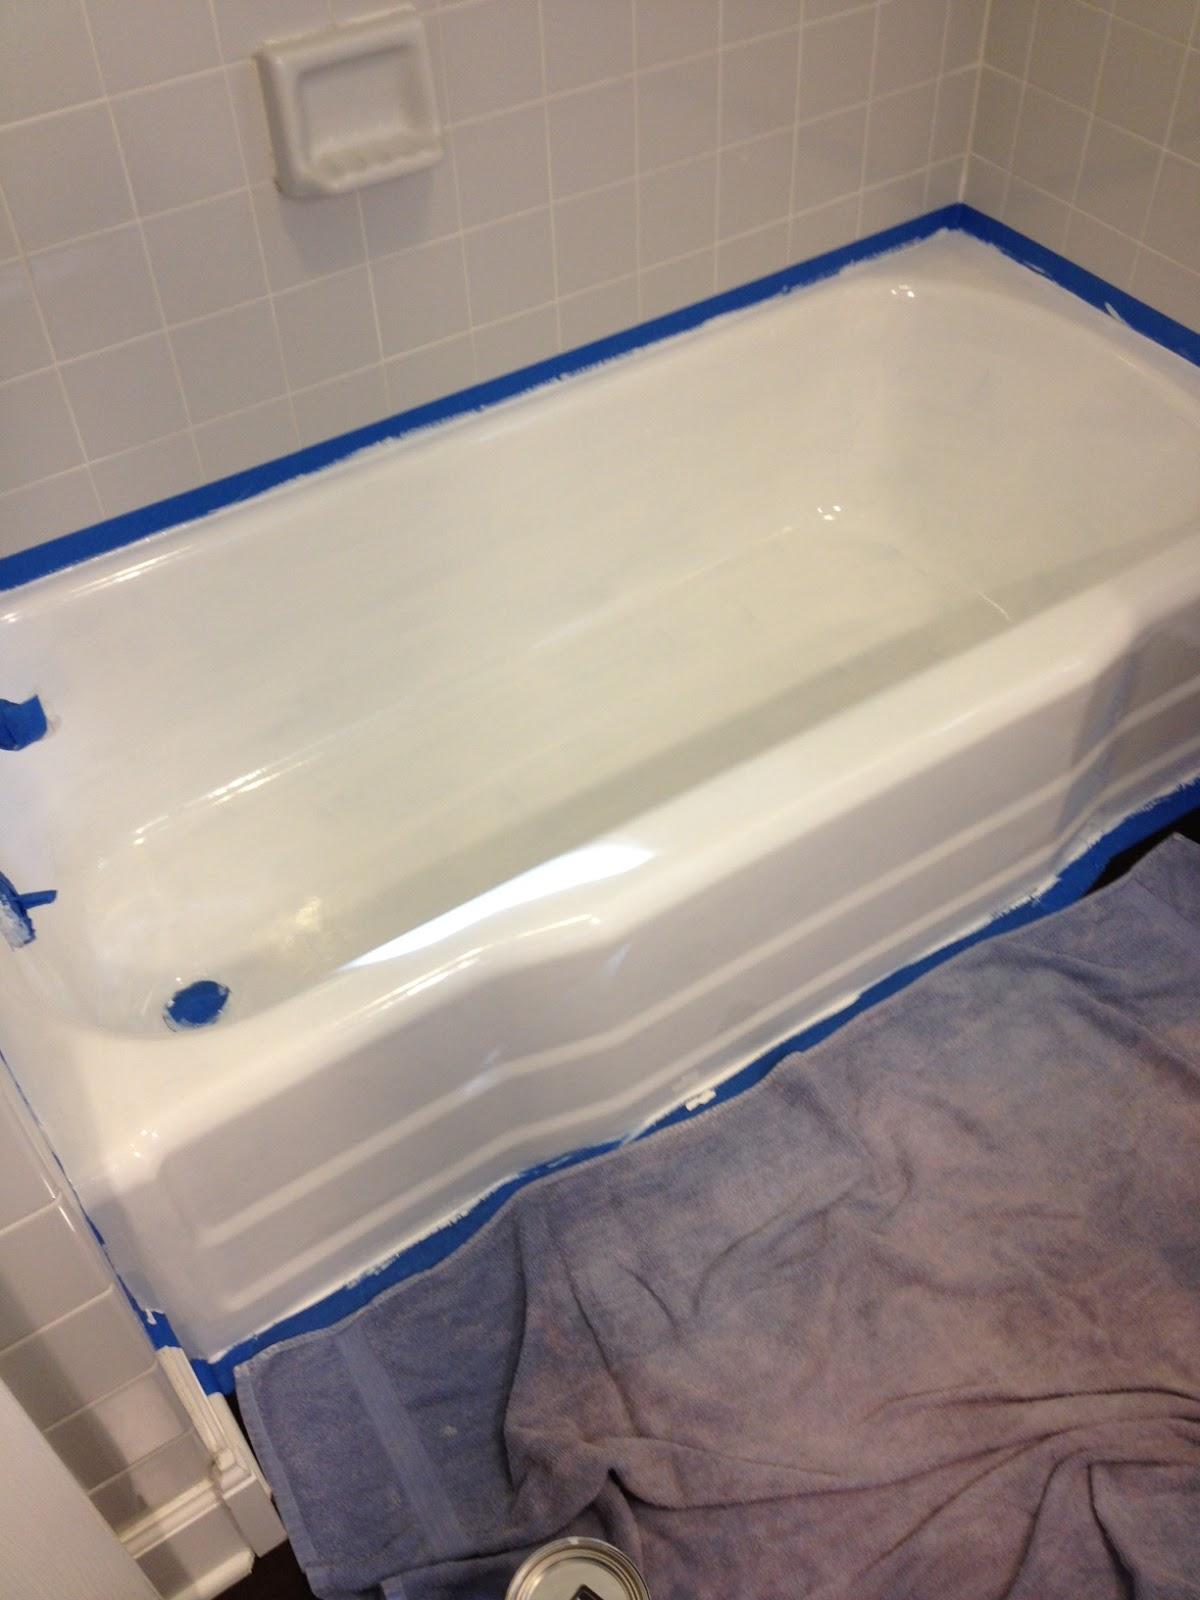 Over on Dover: Refinishing the Bathtub